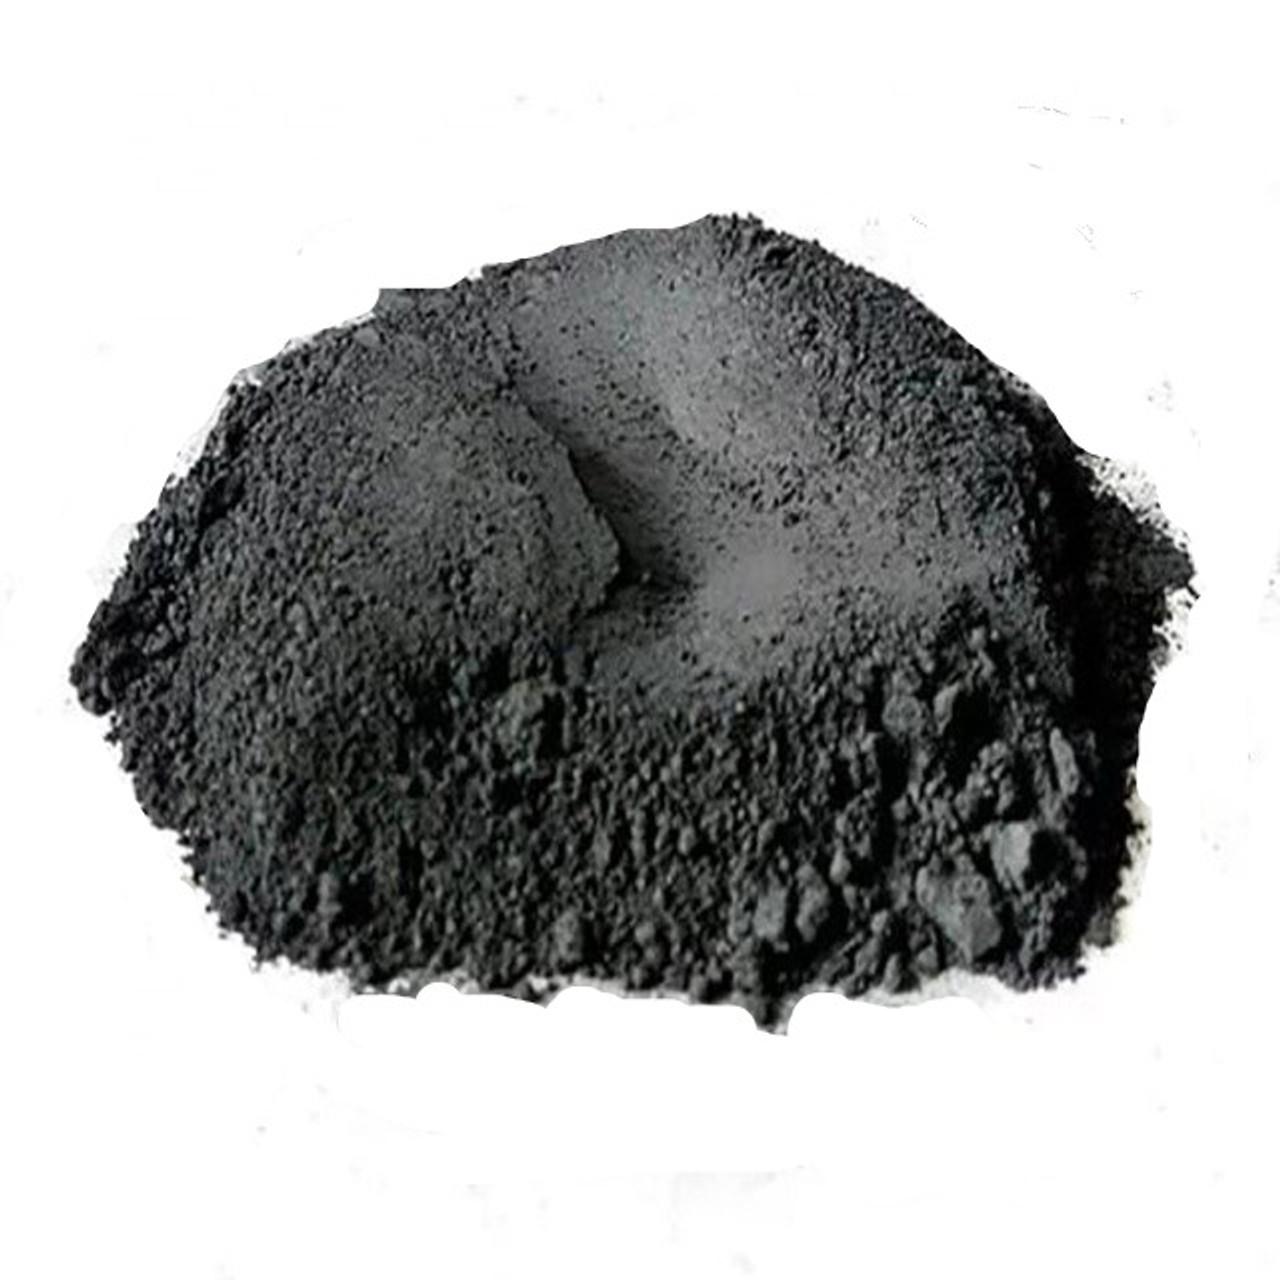 Molybdenum Disulfide (MoS2) Powder, 1.5 Micron